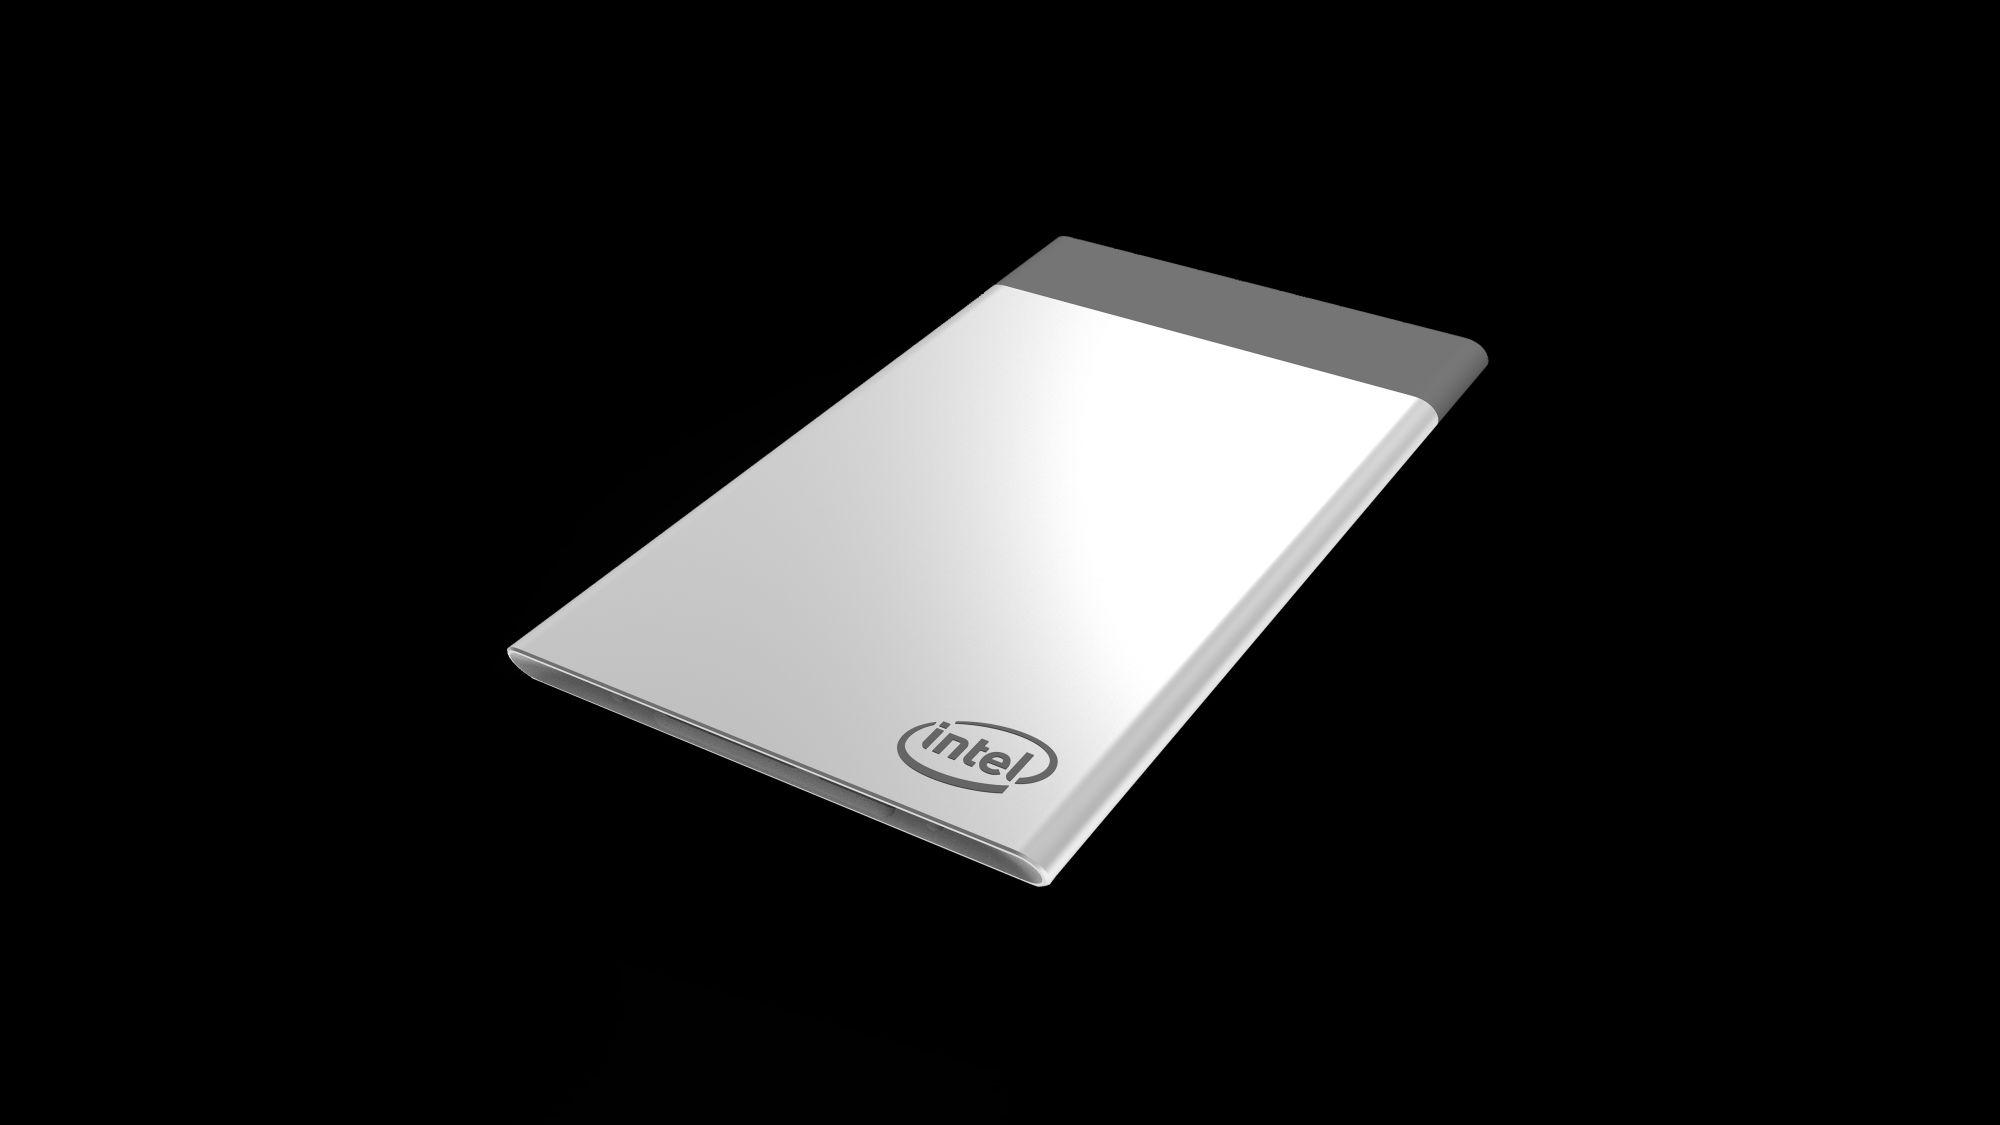 compute-card-side-angled